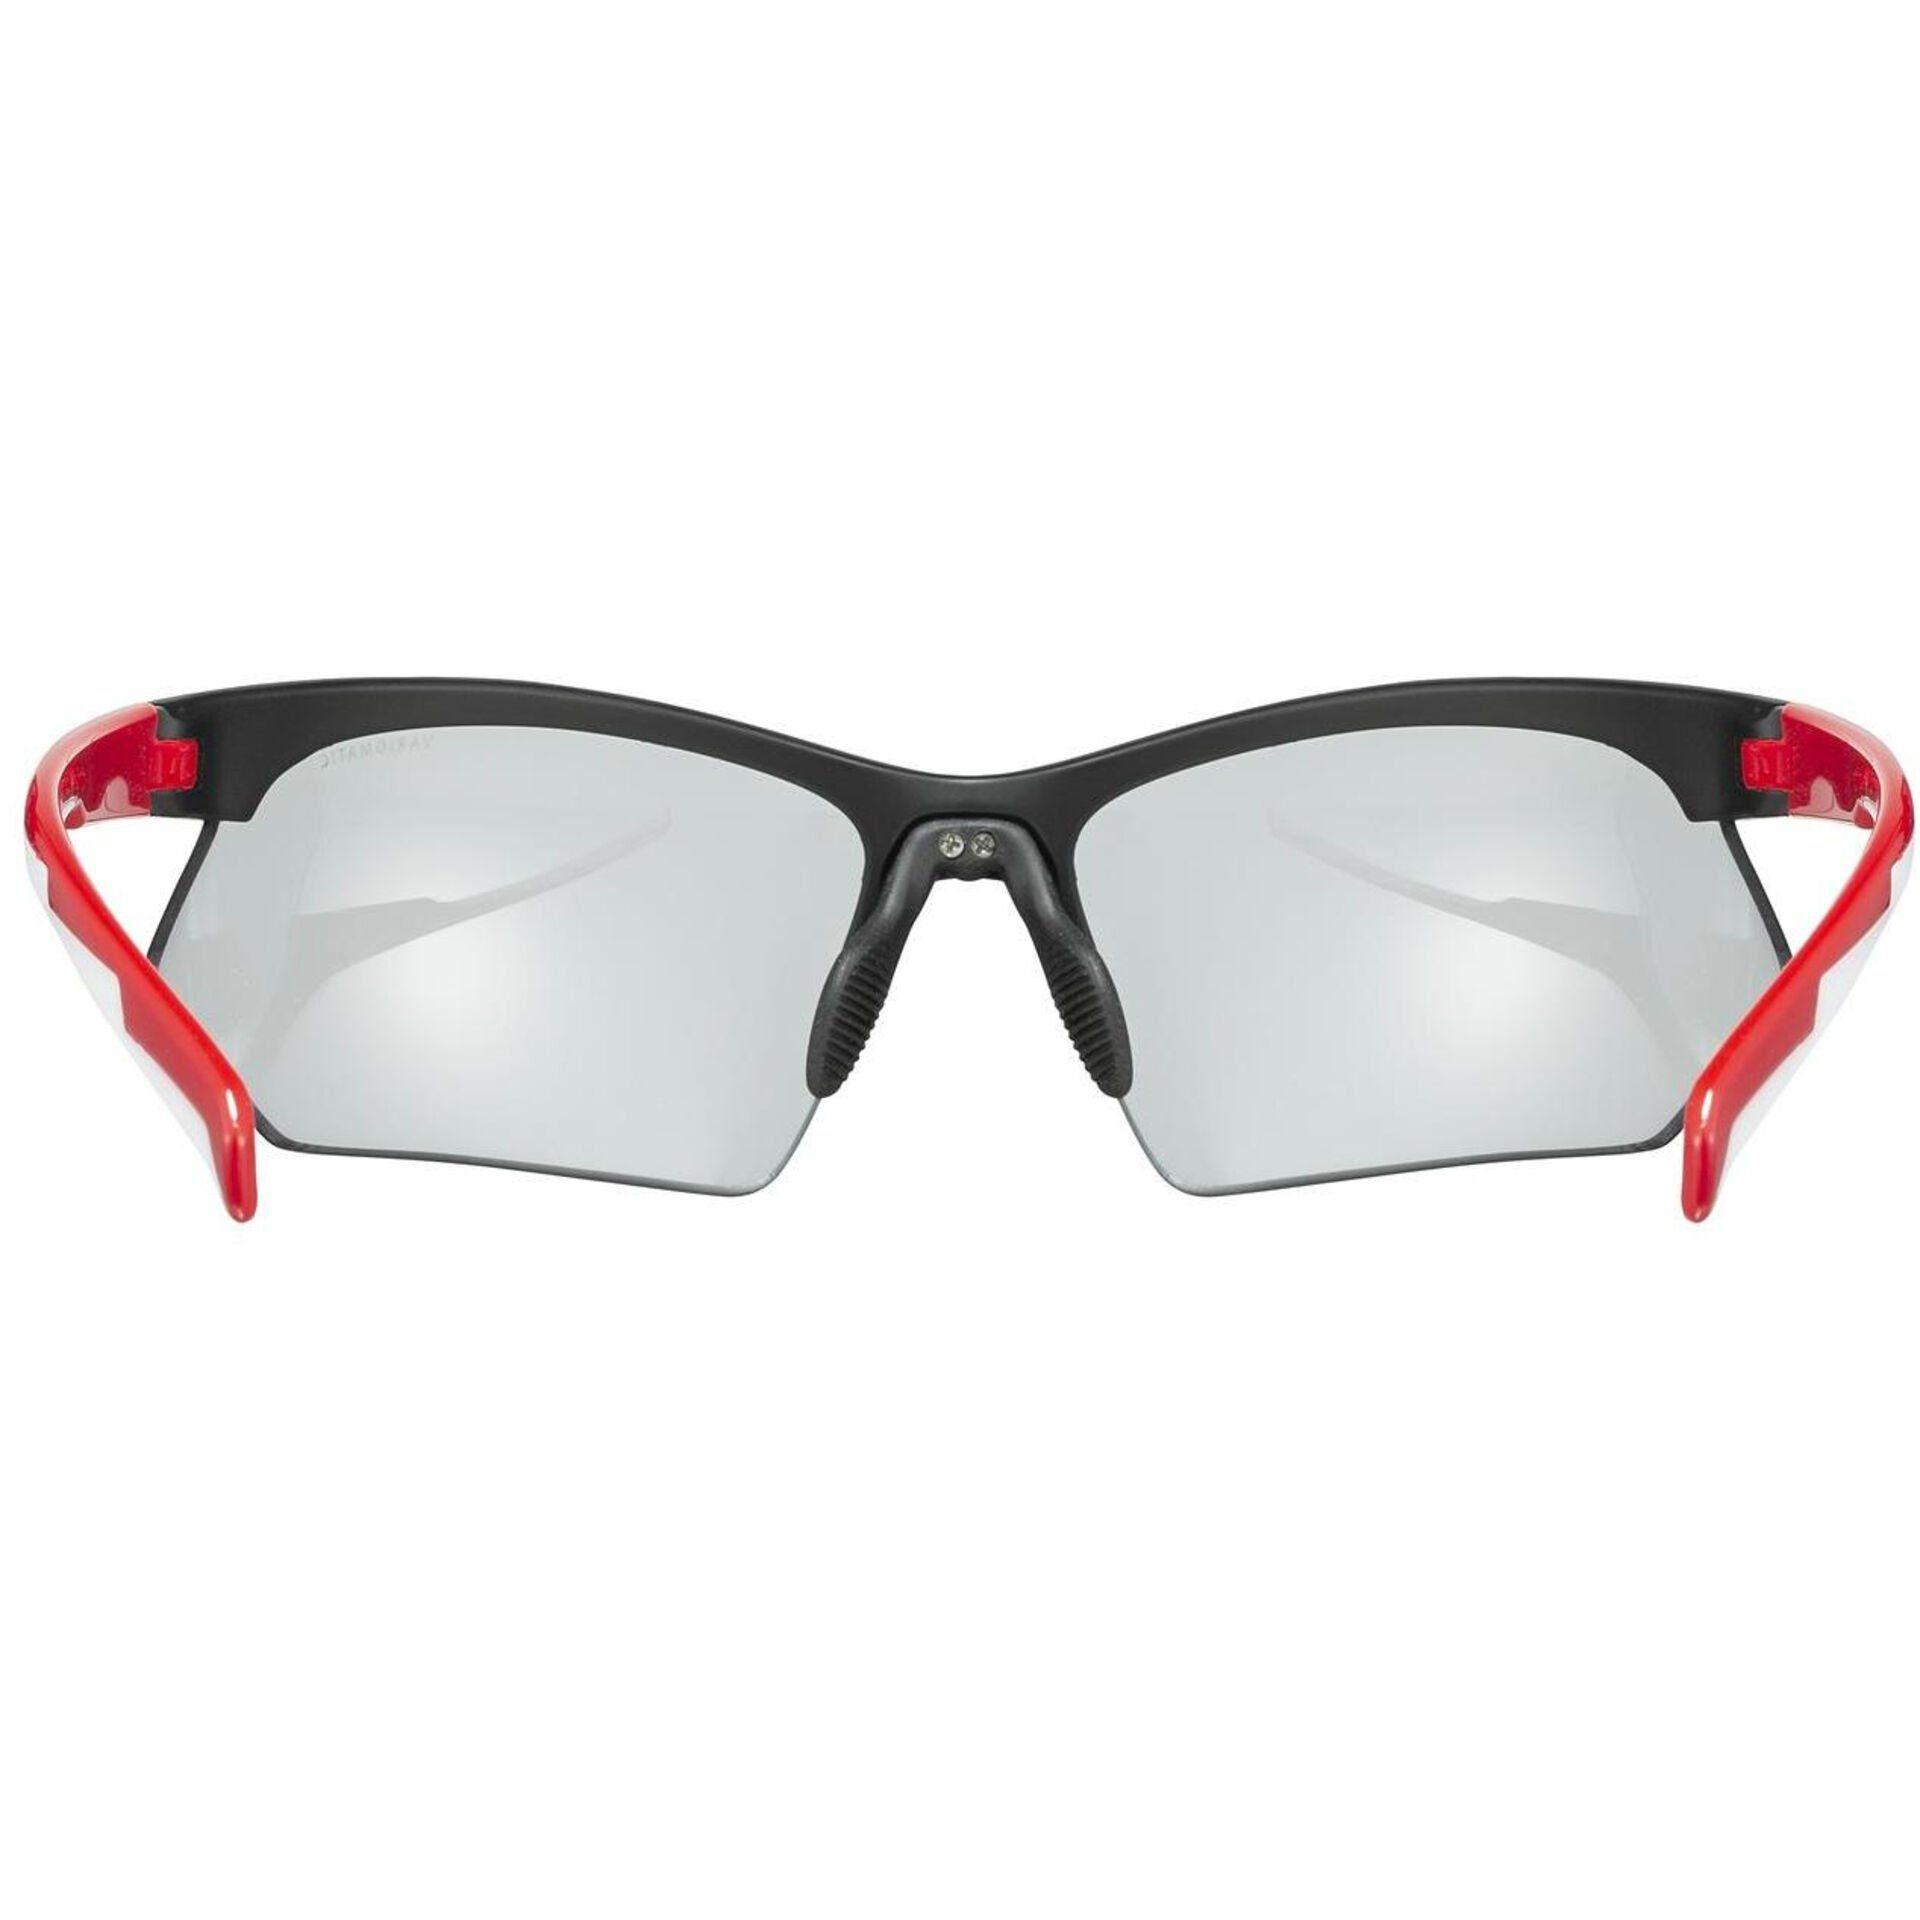 OKULARY UVEX SPORTSTYLE 802 V BLACK RED WNĘTRZE